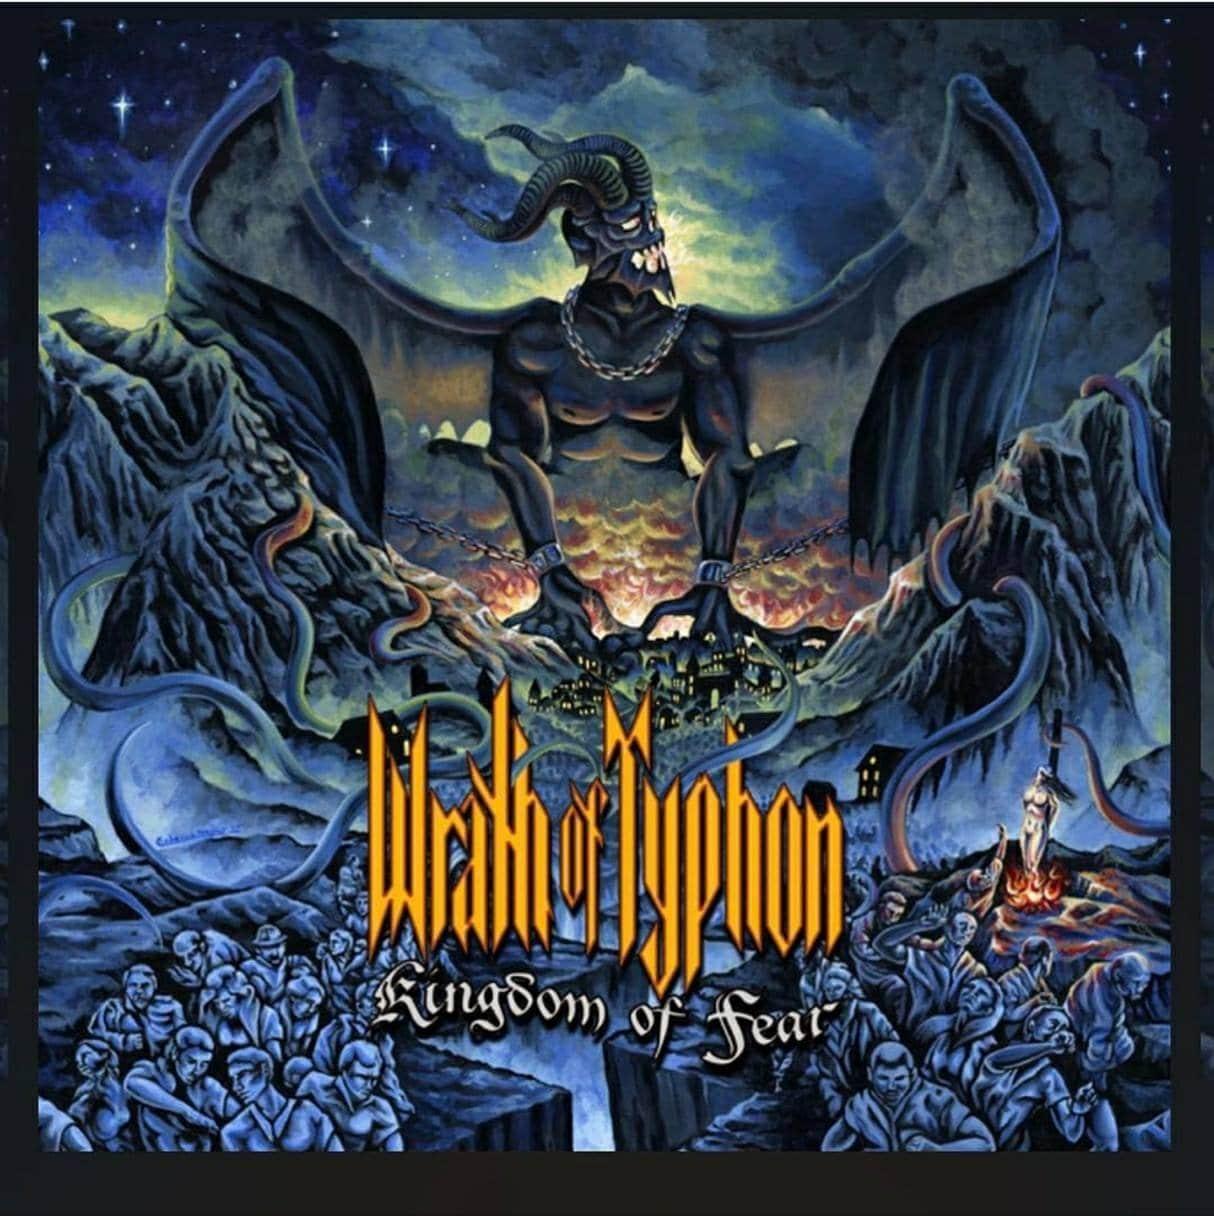 Wrath of Typhon - Kingdom of Fear Album Cover Artwork by Rebecca Magar